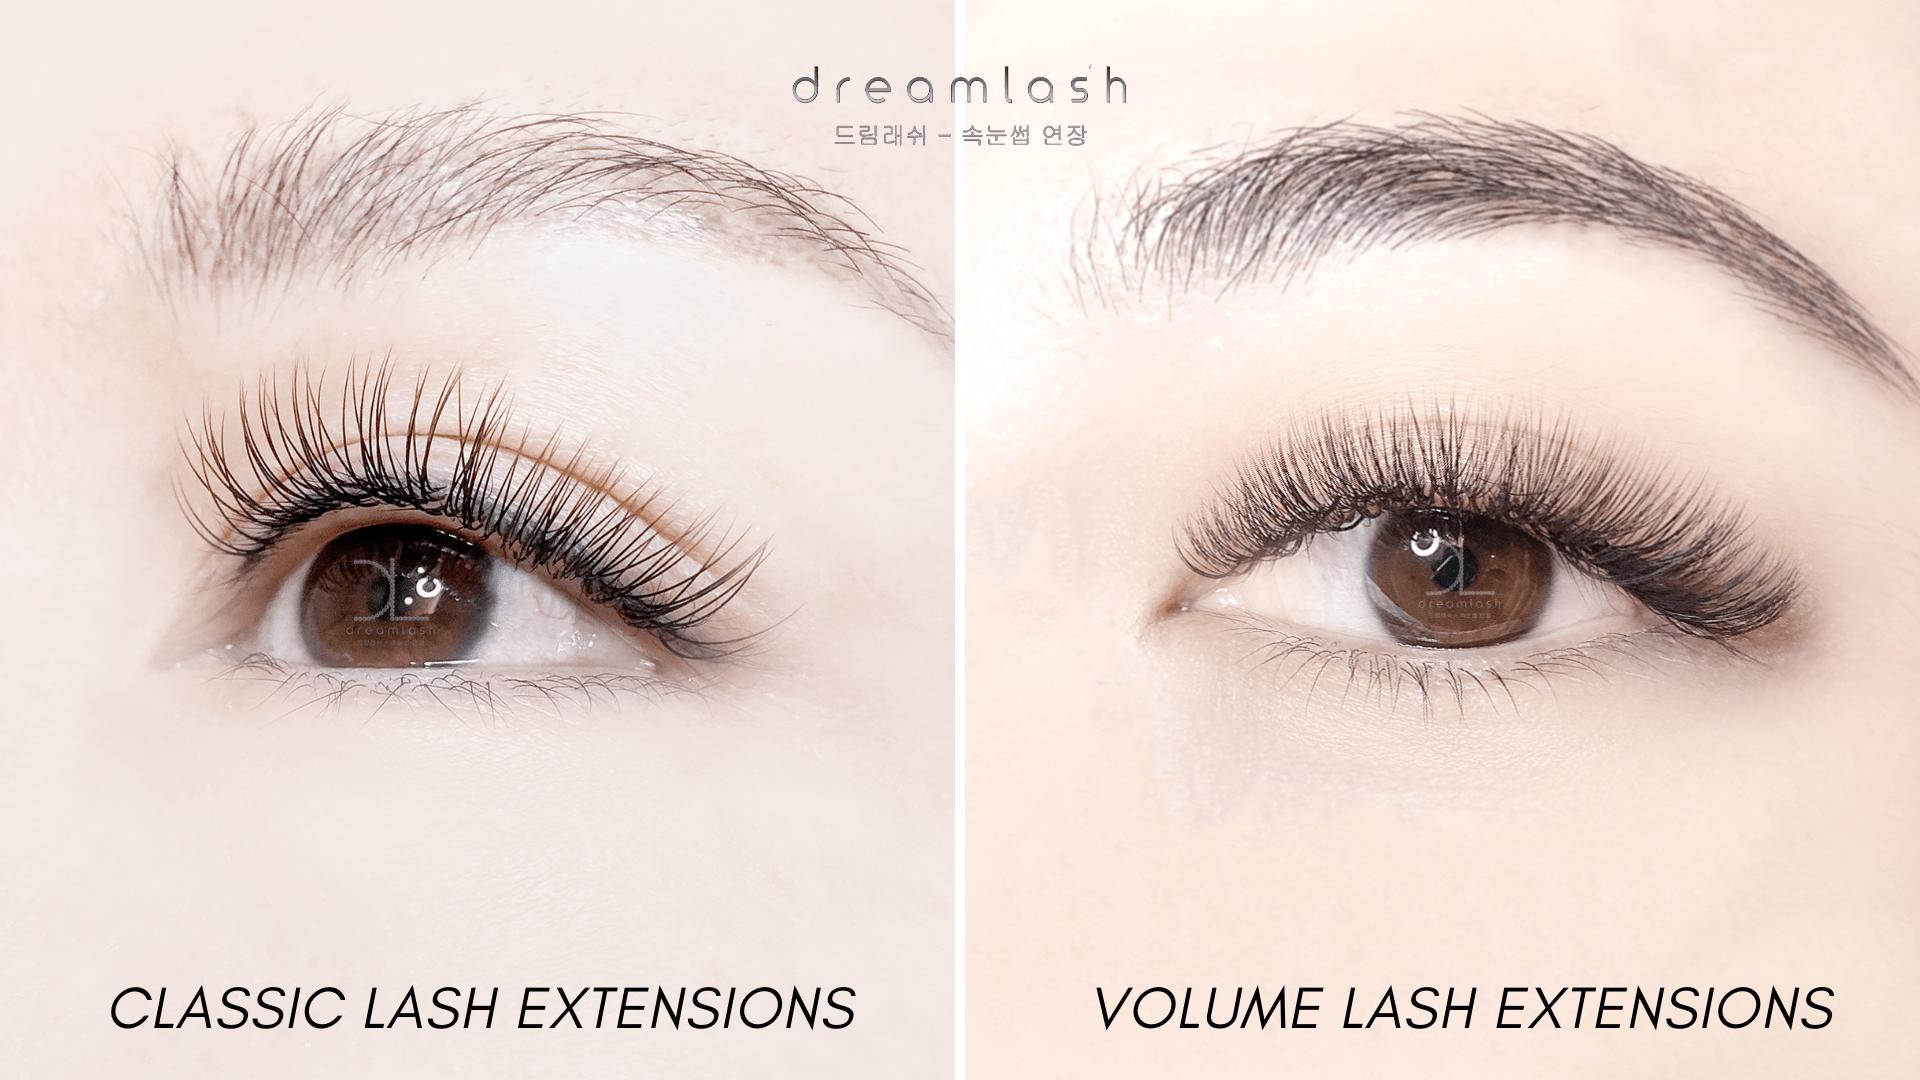 Classic Lash Extensions vs Volume Lash Extensions